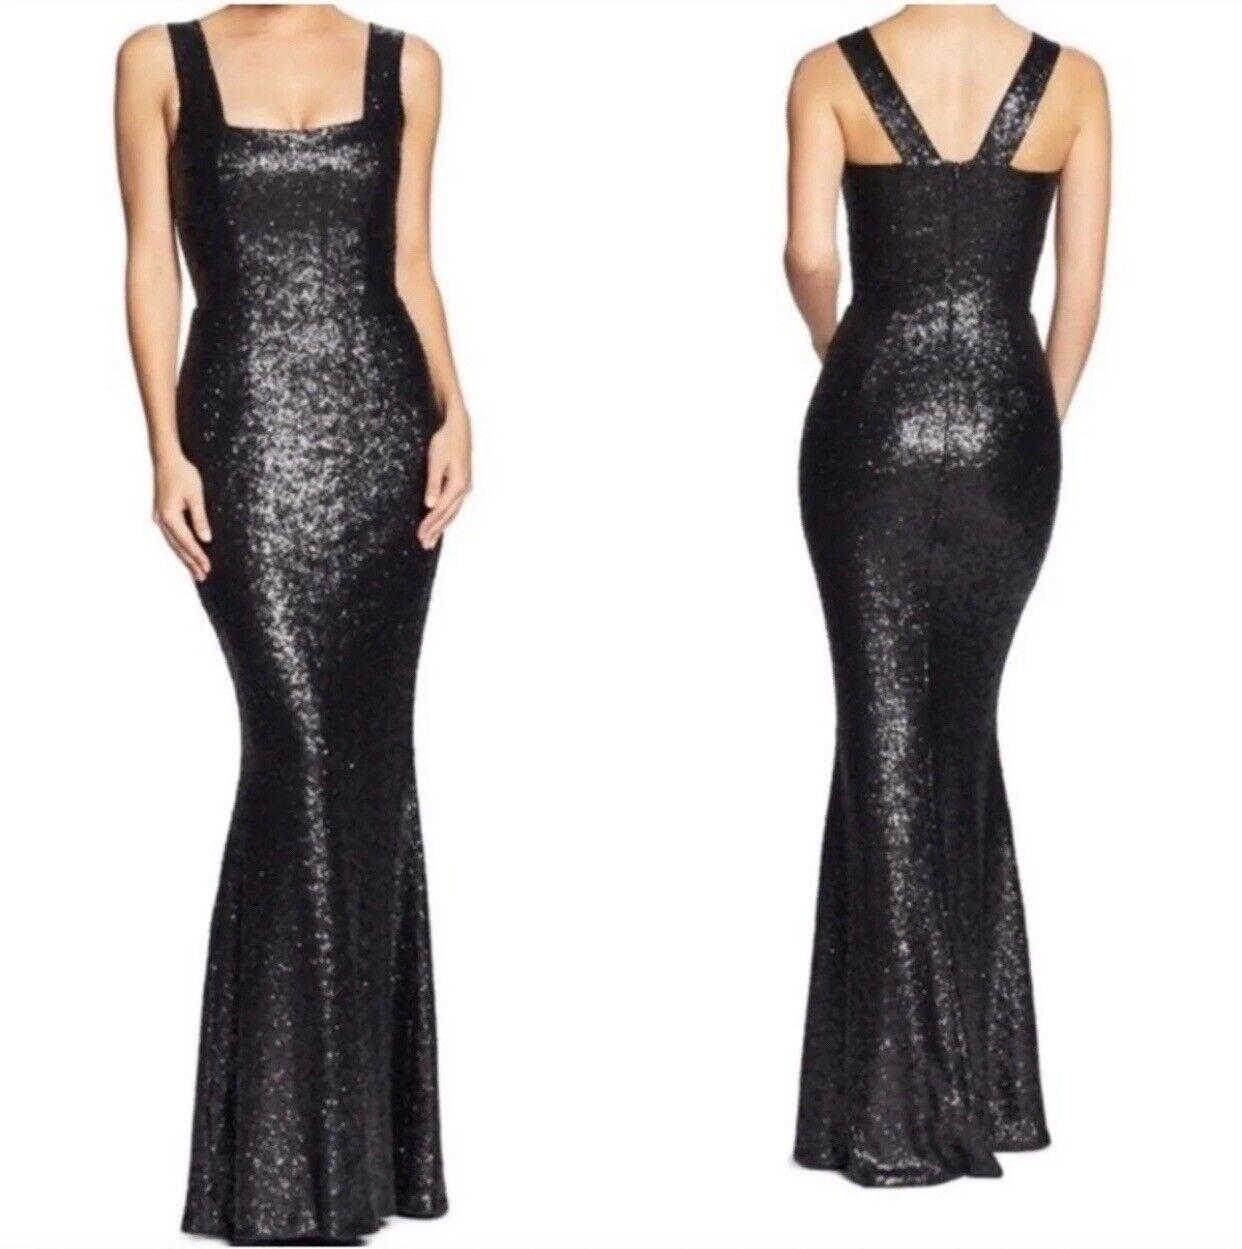 Dress The Population Raven Matte Black Sequins Formal Prom Evening Gown Dress M